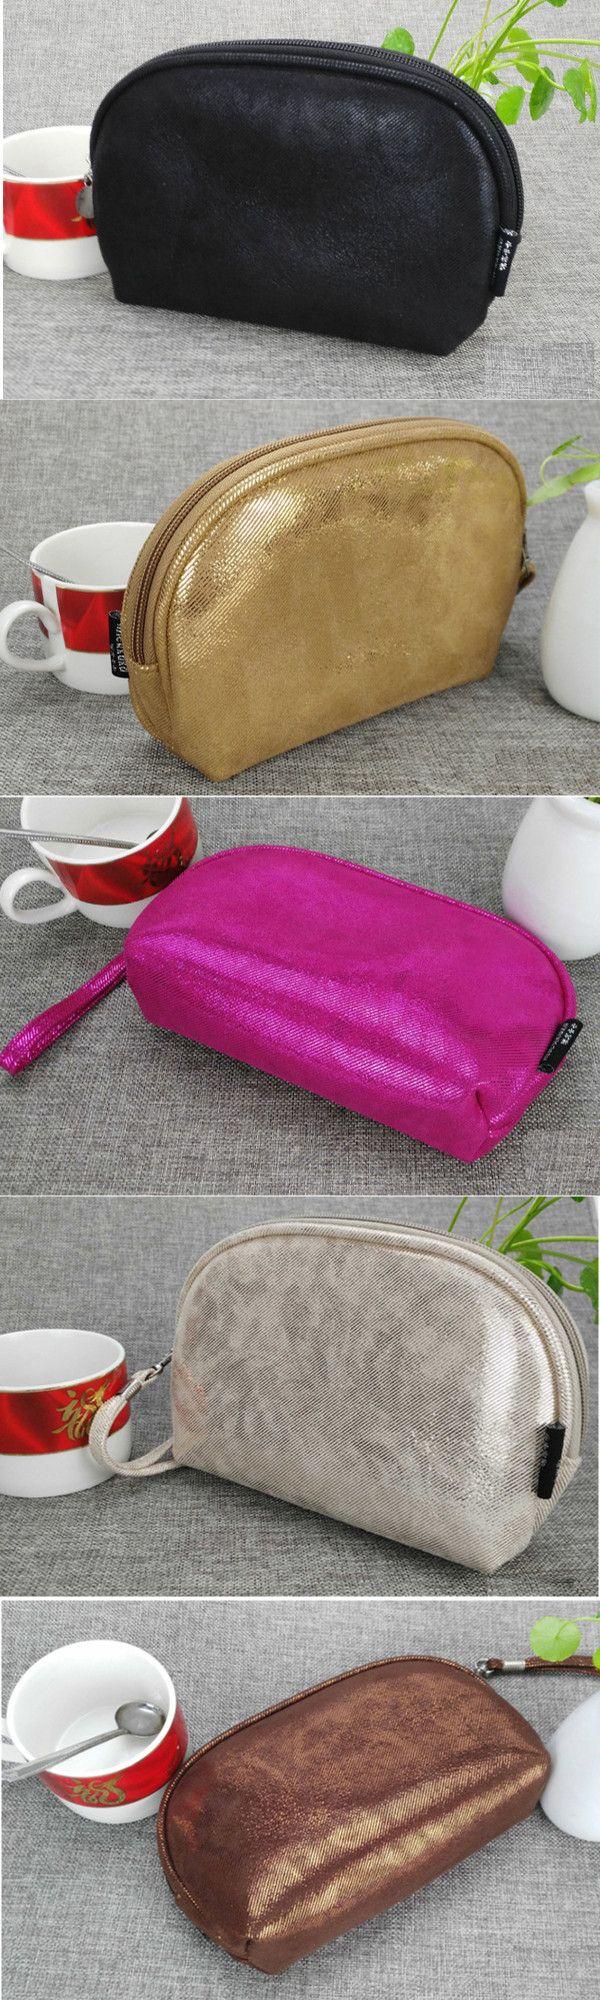 Women PU Zipper Cosmetic Bags Girls Small Coin Bags 5.5 Inches Phone Bags For Iphone Huawei Samsung